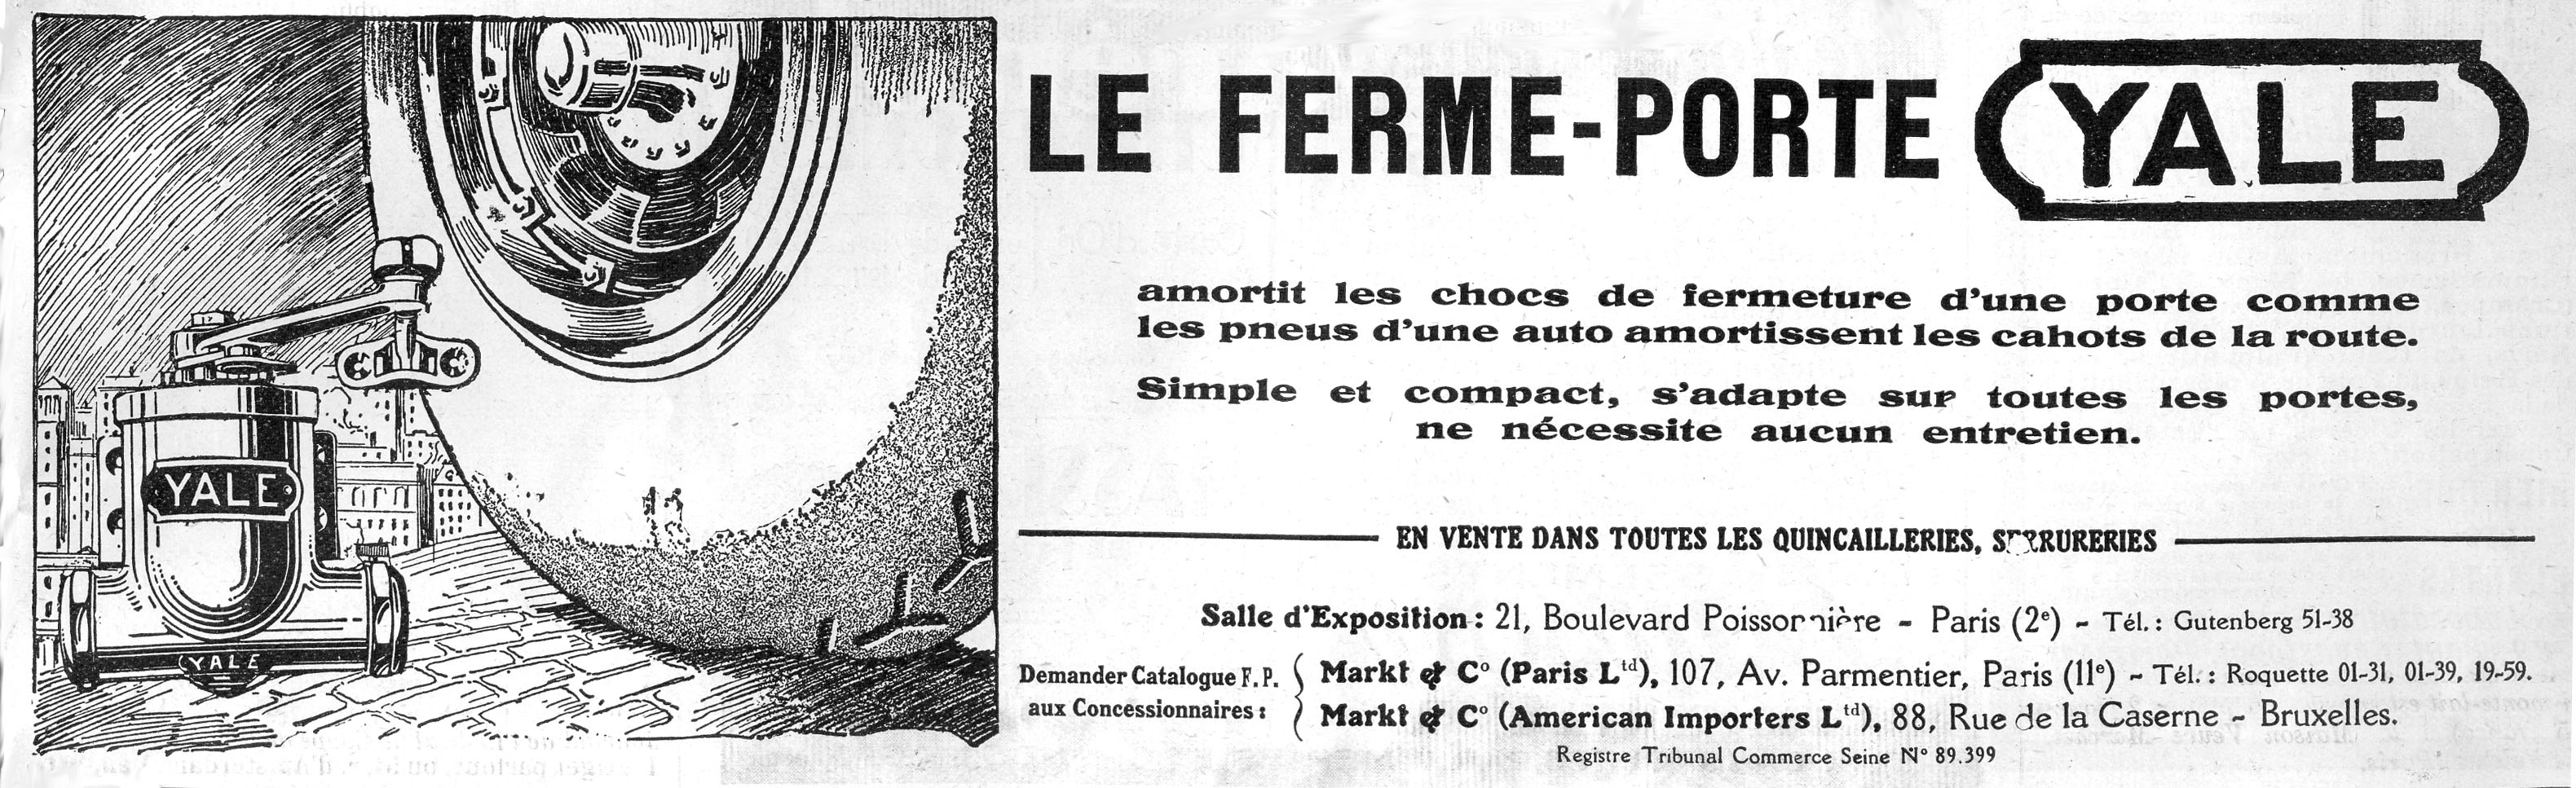 File ferme porte wikimedia commons for Ferme porte yale